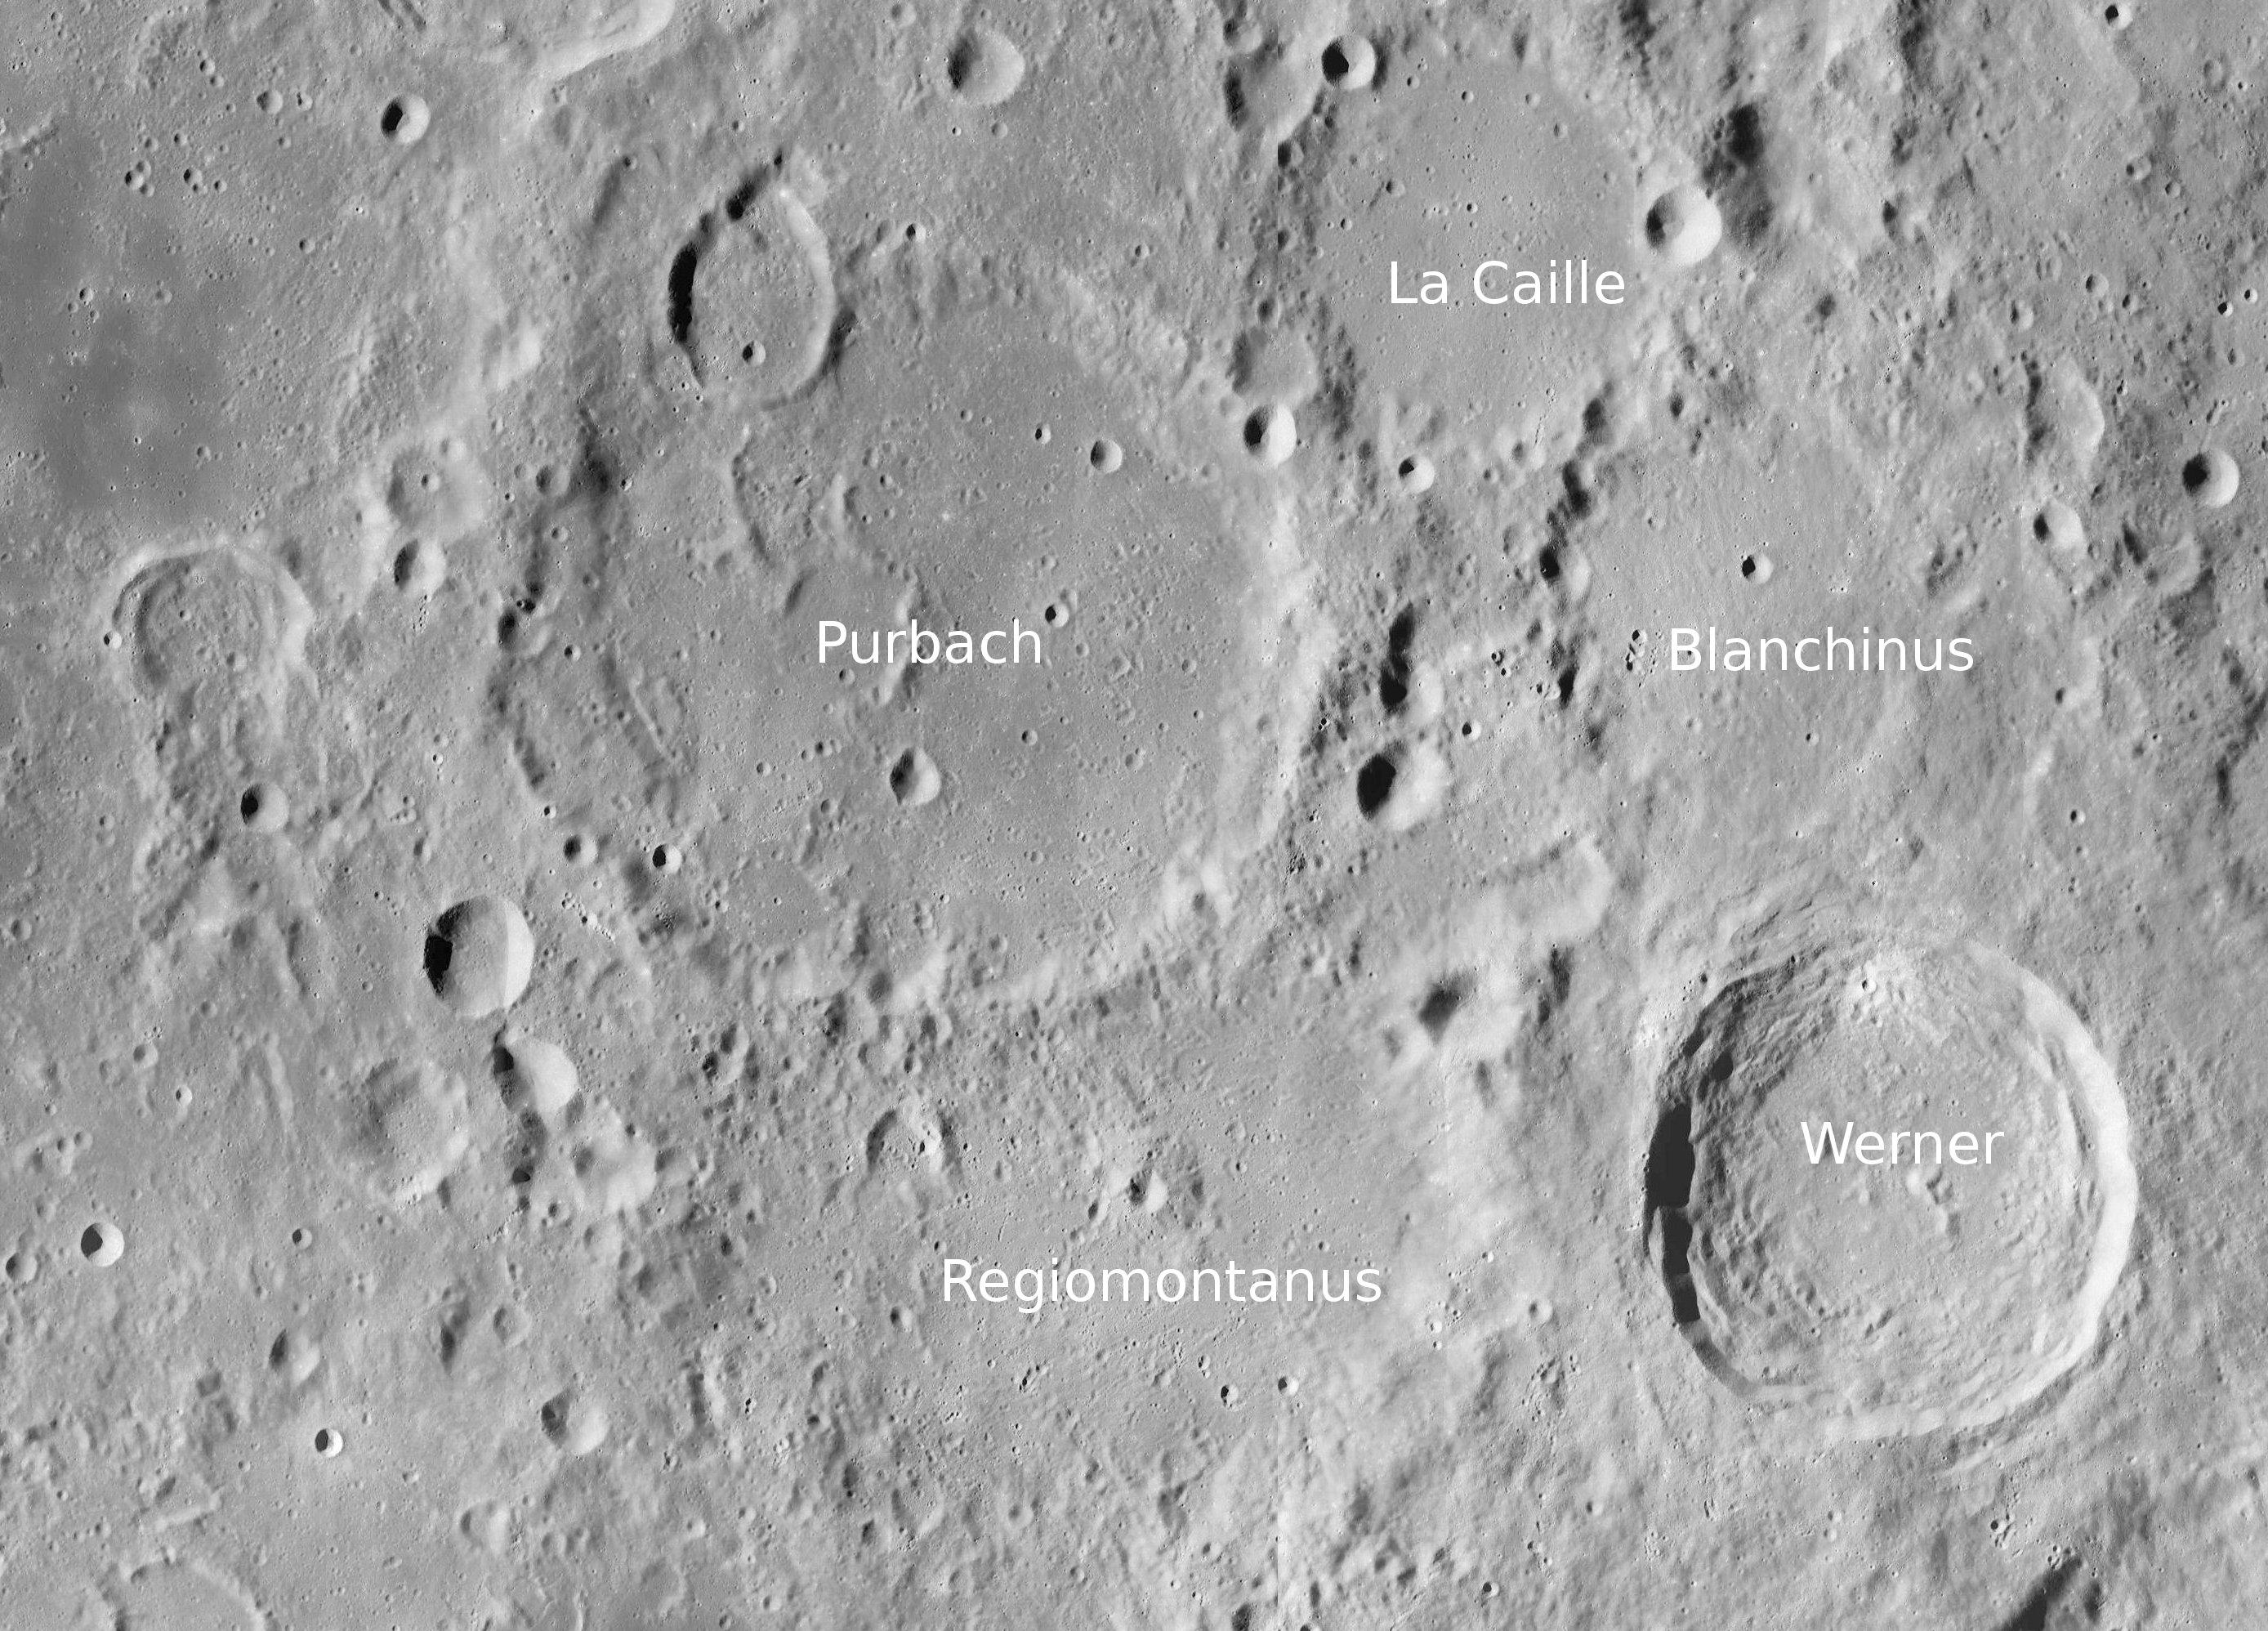 Purbach + Regiomontanus + Werner - LROC - WAC.JPG